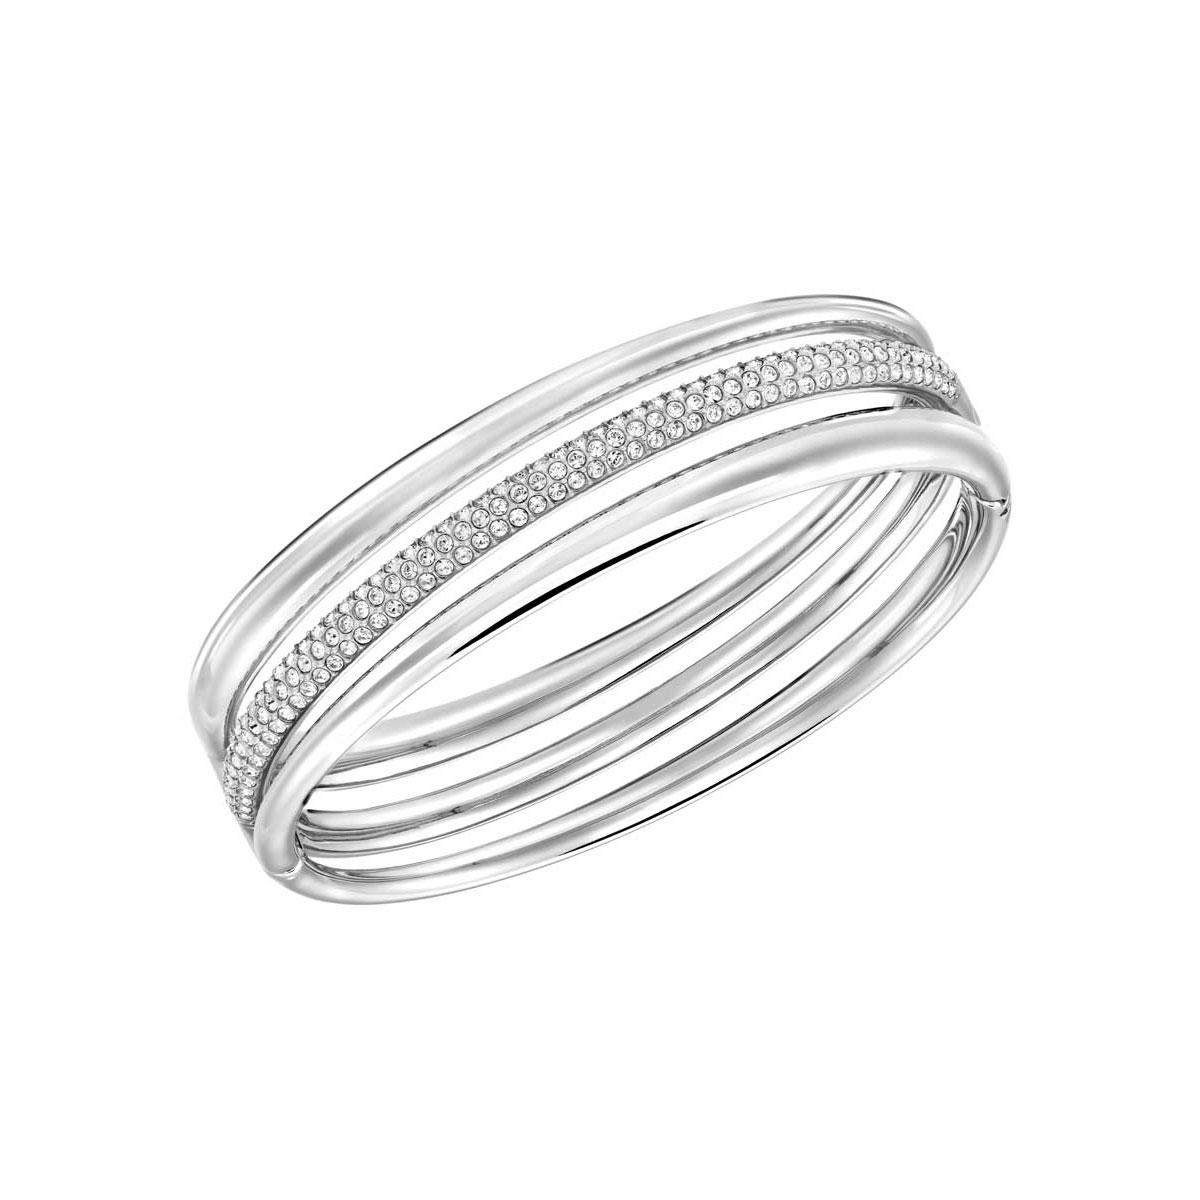 Swarovski Exact Crystal and Rhodium Bangle Bracelet